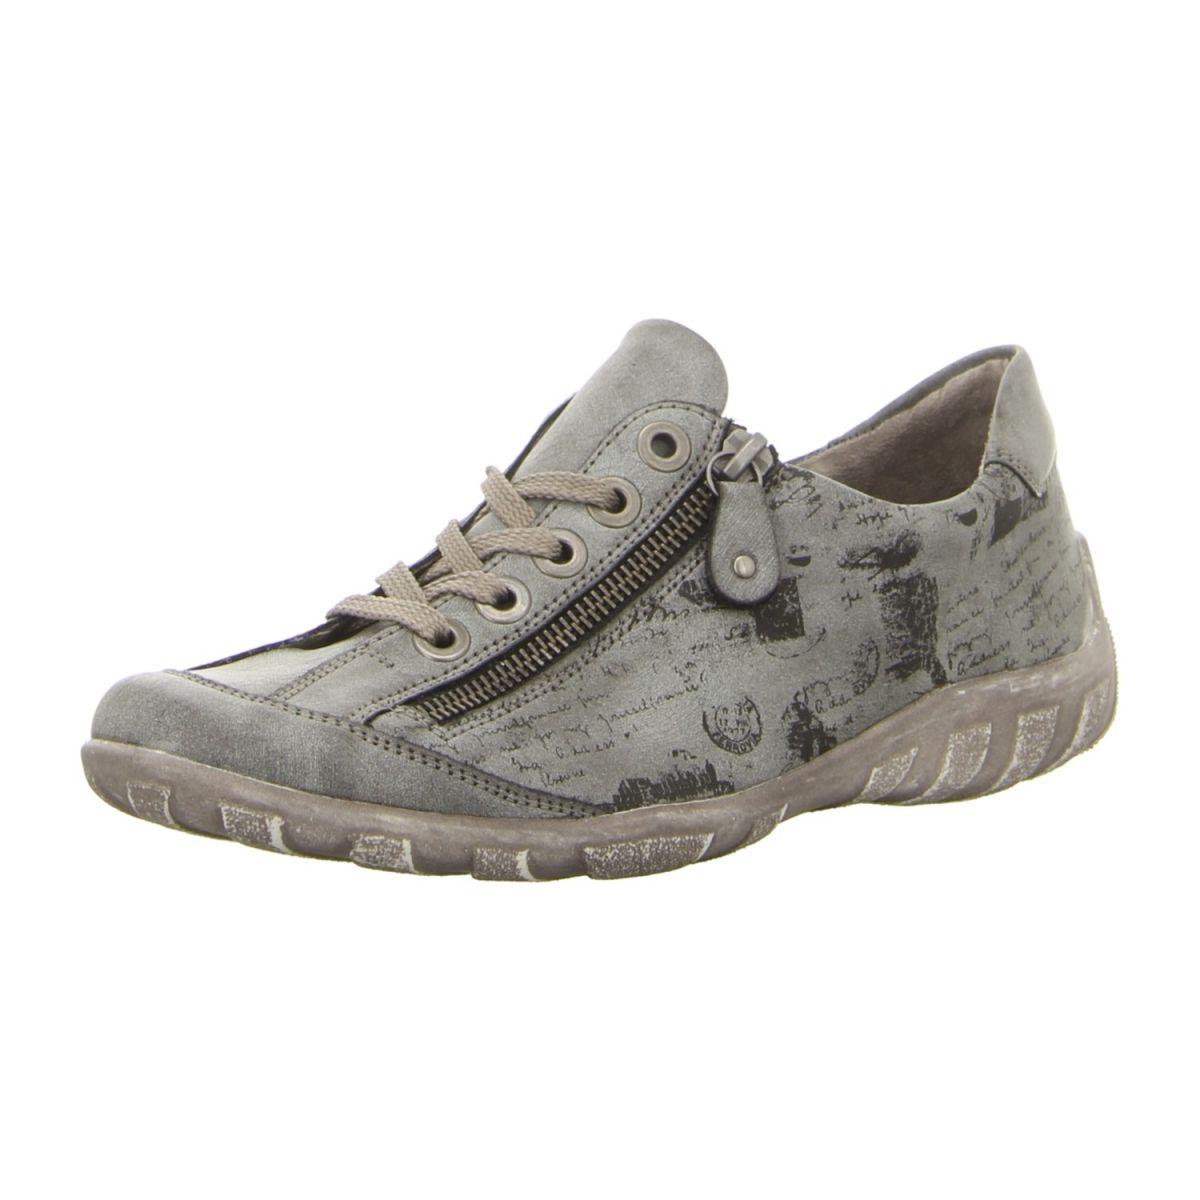 Remonte  zapatos  Schnürschuh R3435-45 grau kombi NEU (grau) NEU kombi d0eb01